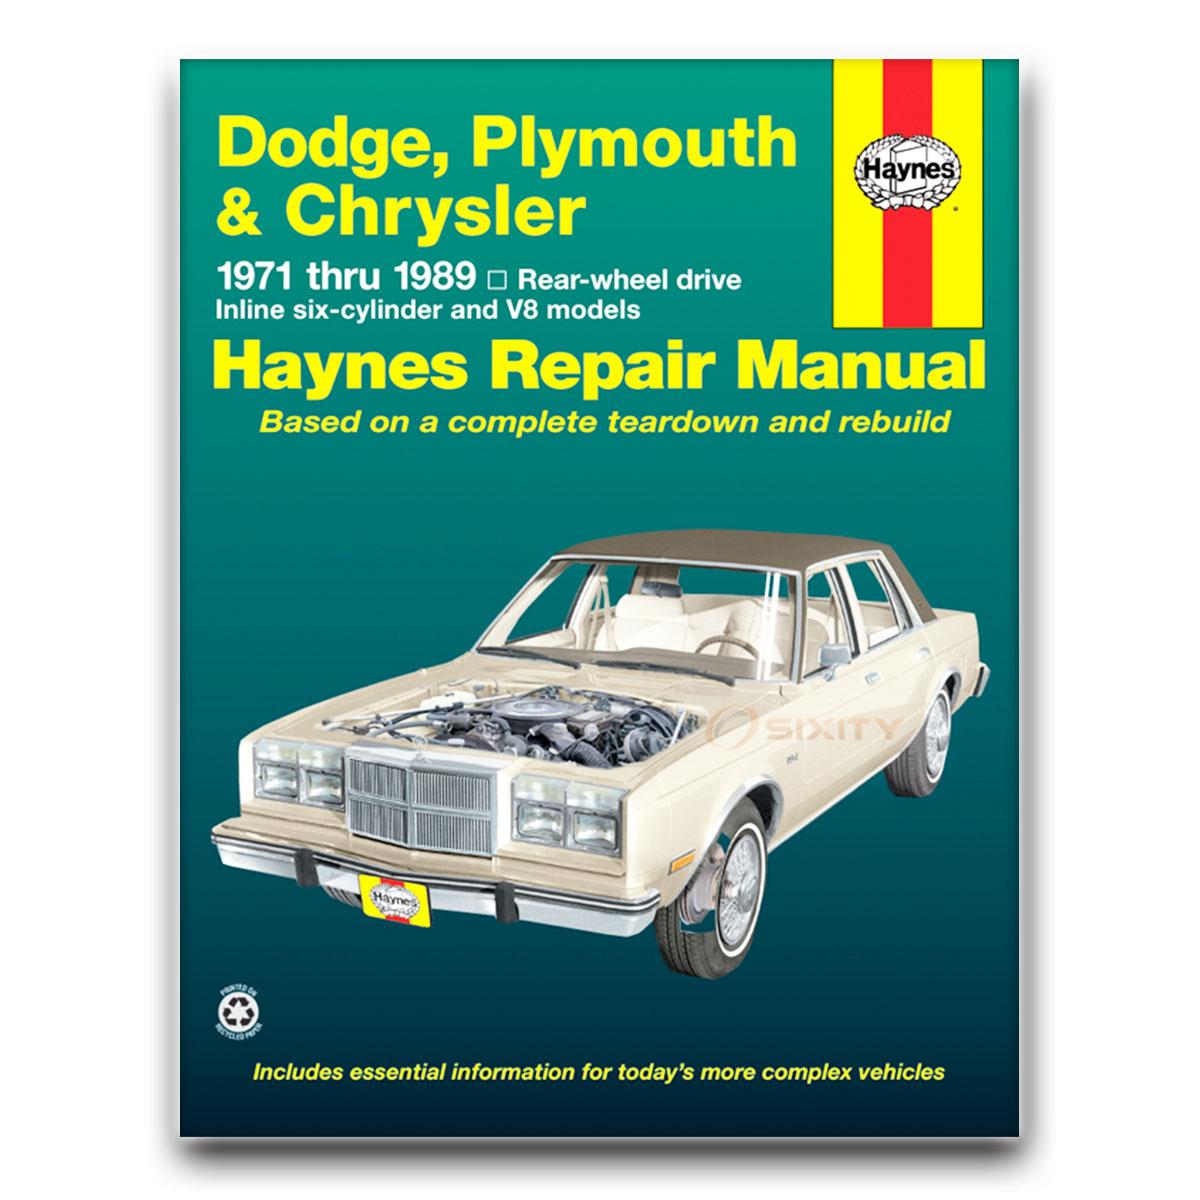 Haynes Repair Manual for Chrysler Town & Country (Car) Base Shop Service mt